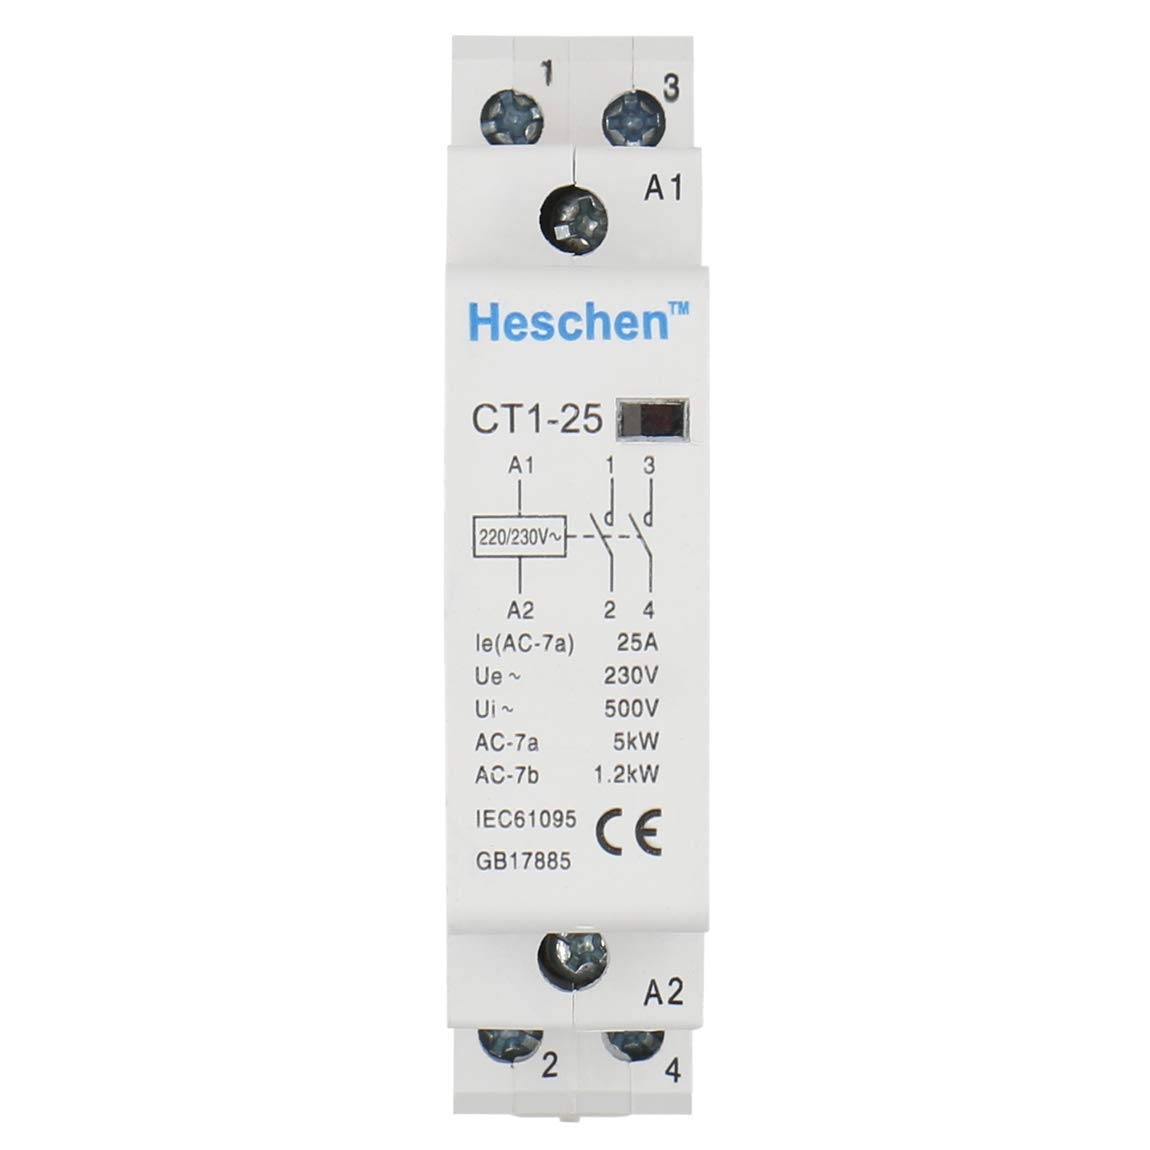 /2/NA 230/V Contactor 25 Legrand//Bticino/